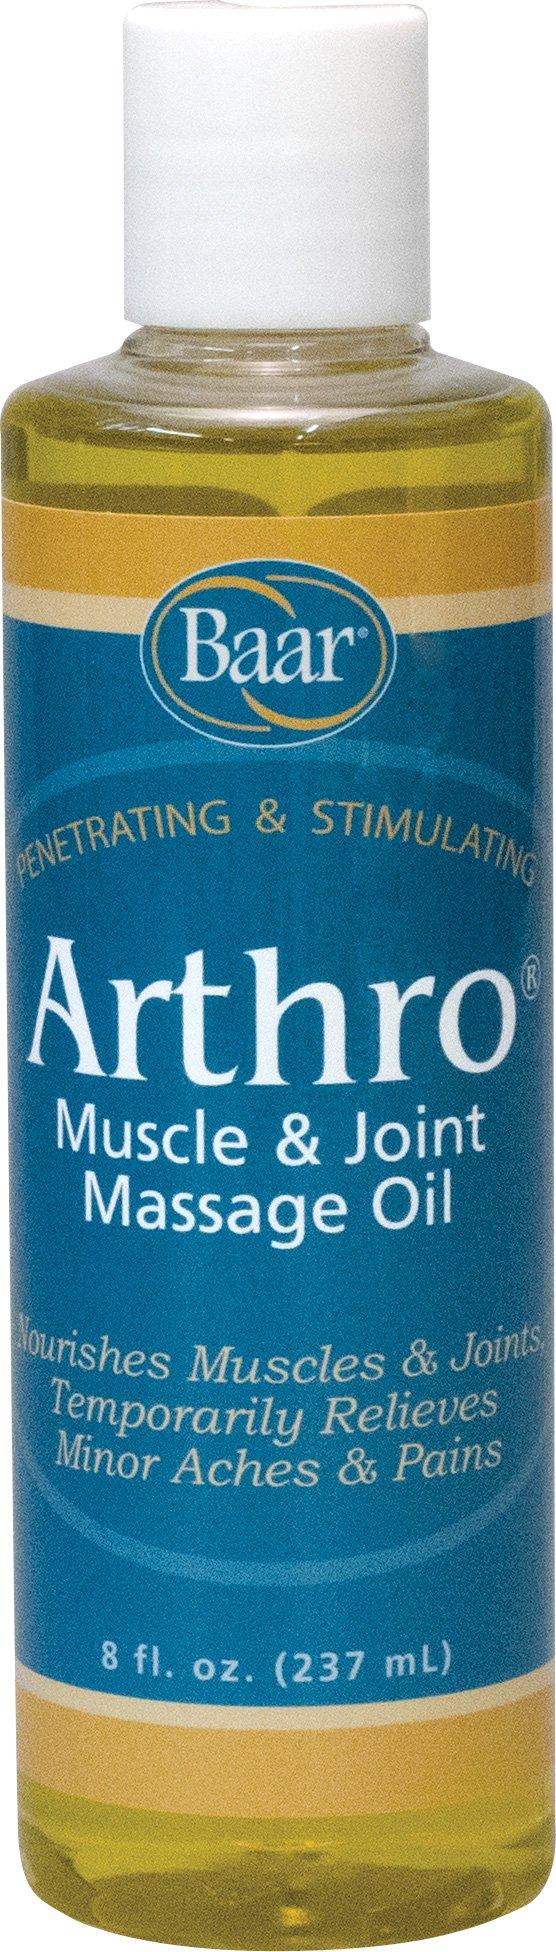 Arthro - Muscle & Joint Massage Oil, 8 oz.